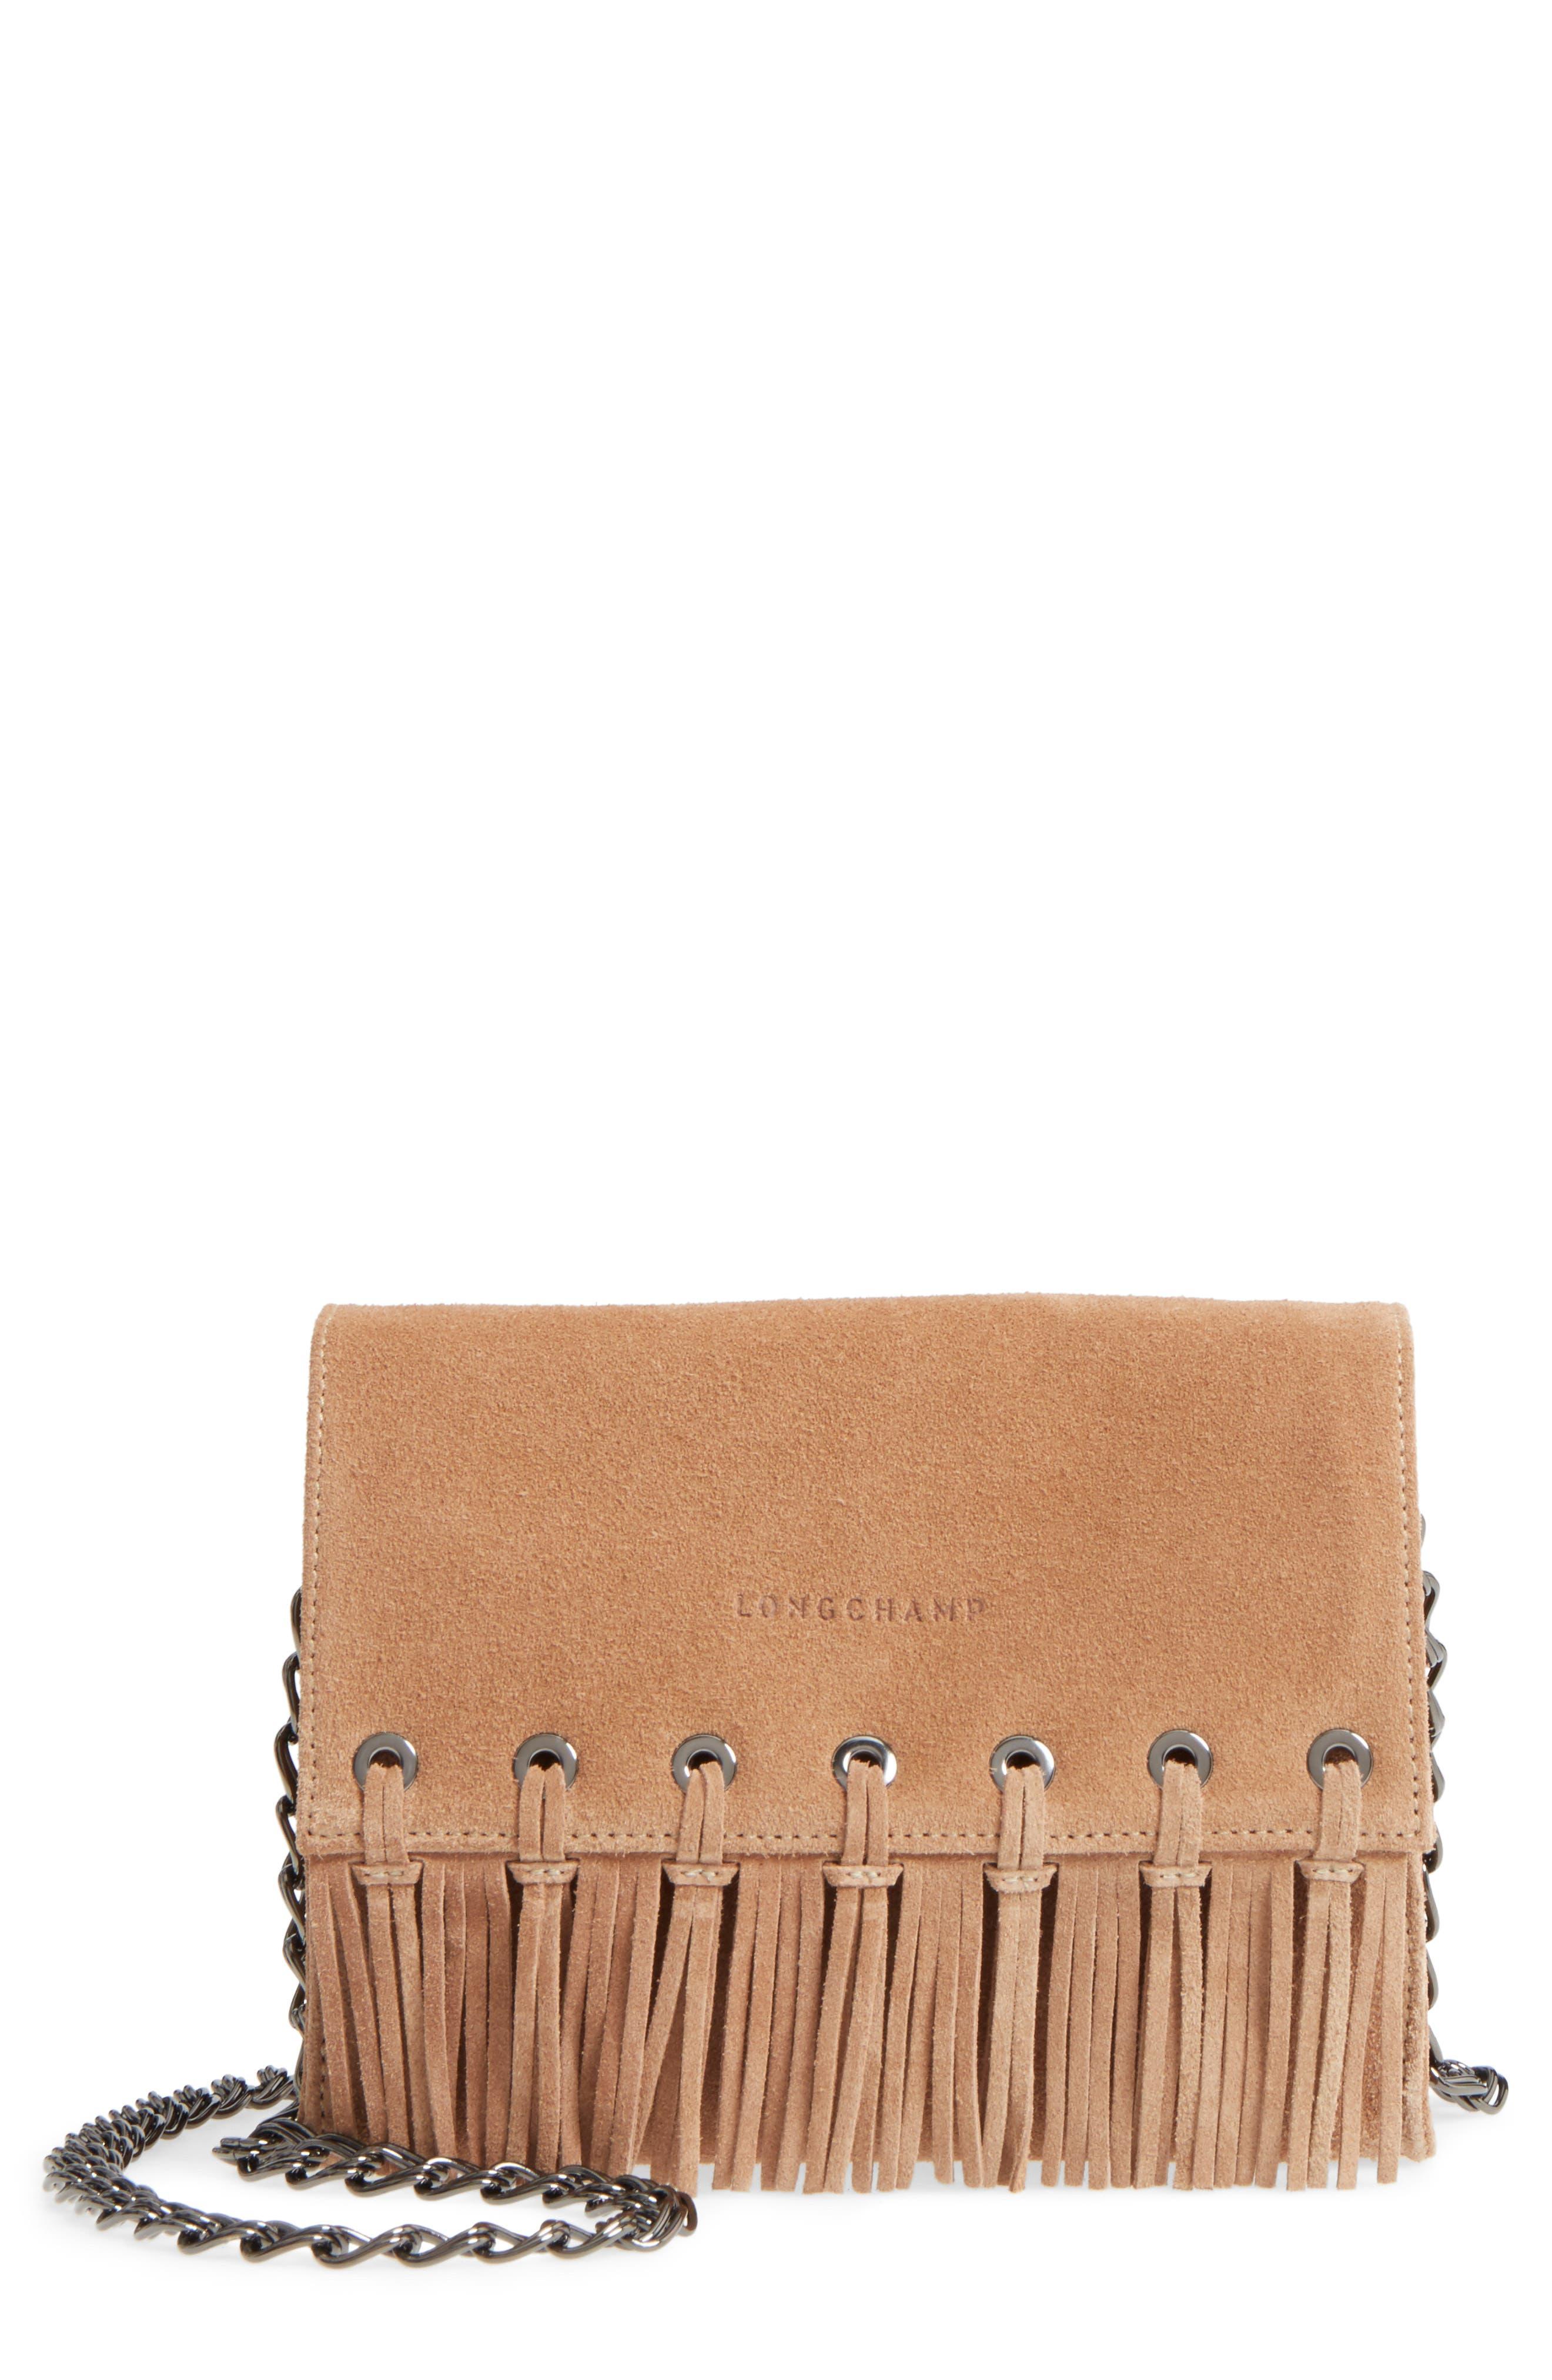 Longchamp Paris Rocks Fringe Calfskin Suede Crossbody Bag